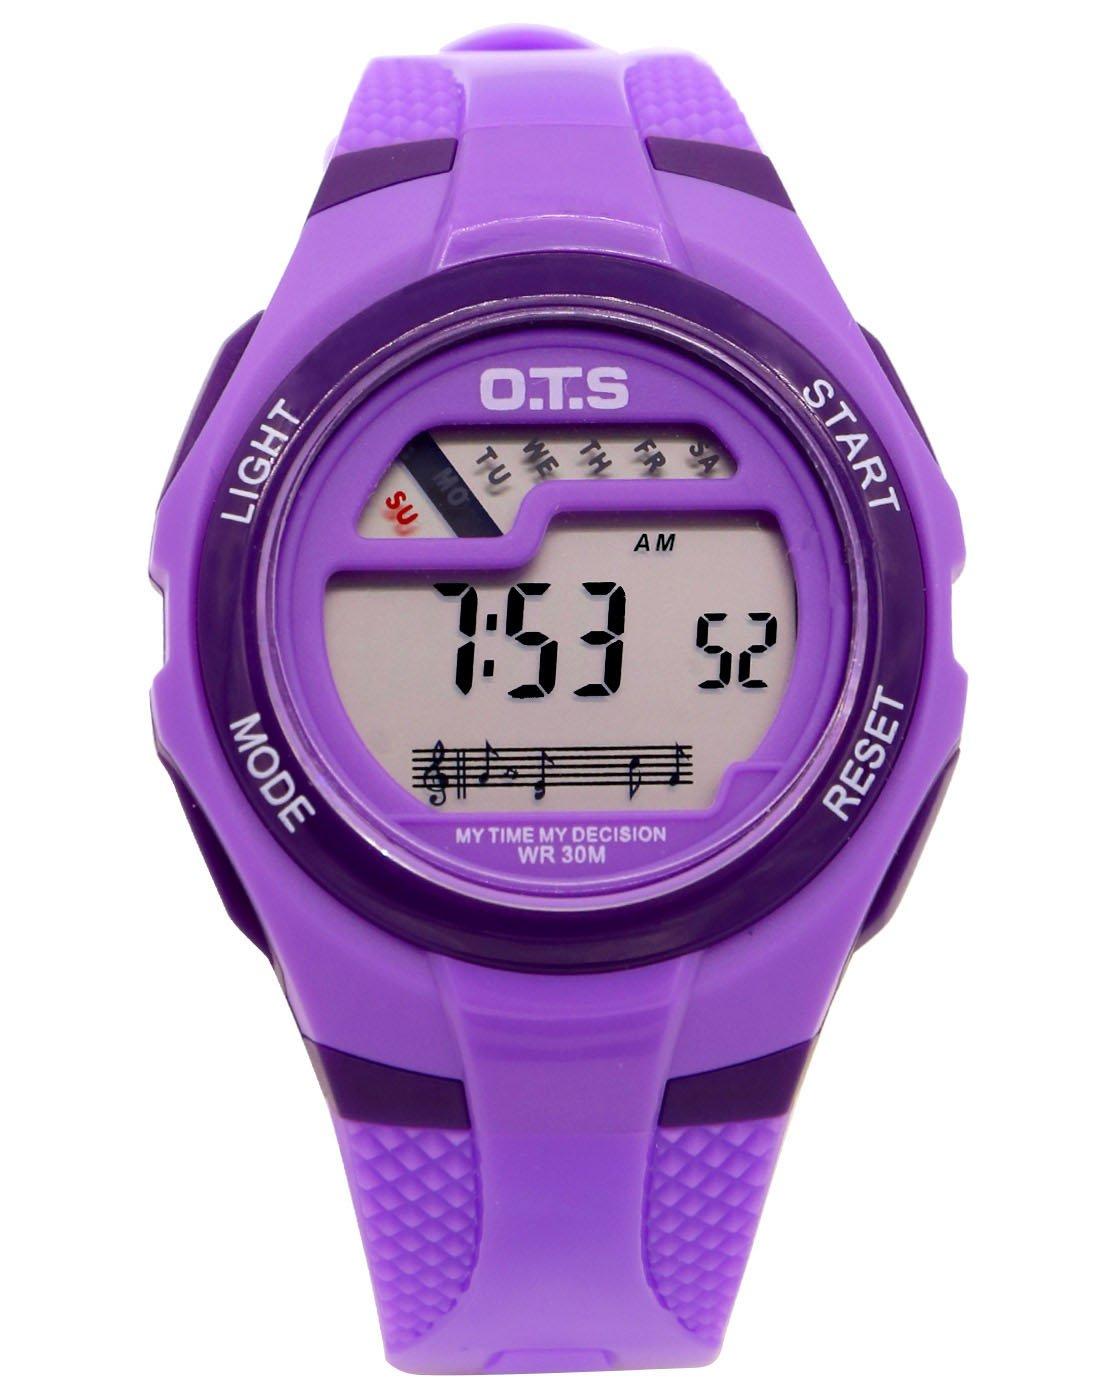 O.T.S Fashion Waterproof Children Boys Girls Digital Sport Watch with Alarm, Chronograph, Date by OTS